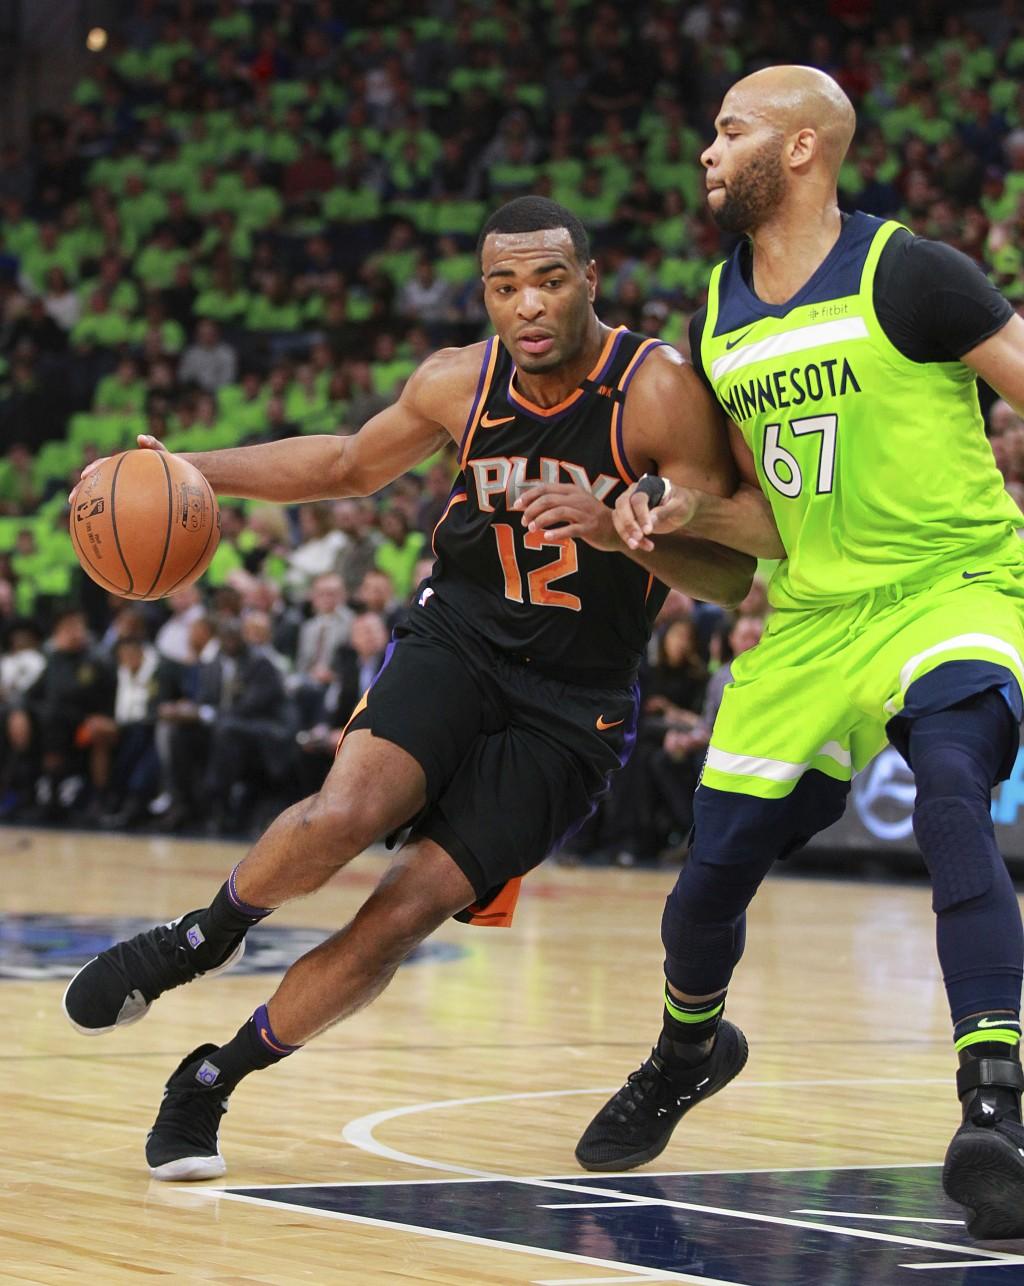 Phoenix Suns forward T.J. Warren (12) drives against Minnesota Timberwolves center Taj Gibson (67) in the first quarter of an NBA basketball game on S...